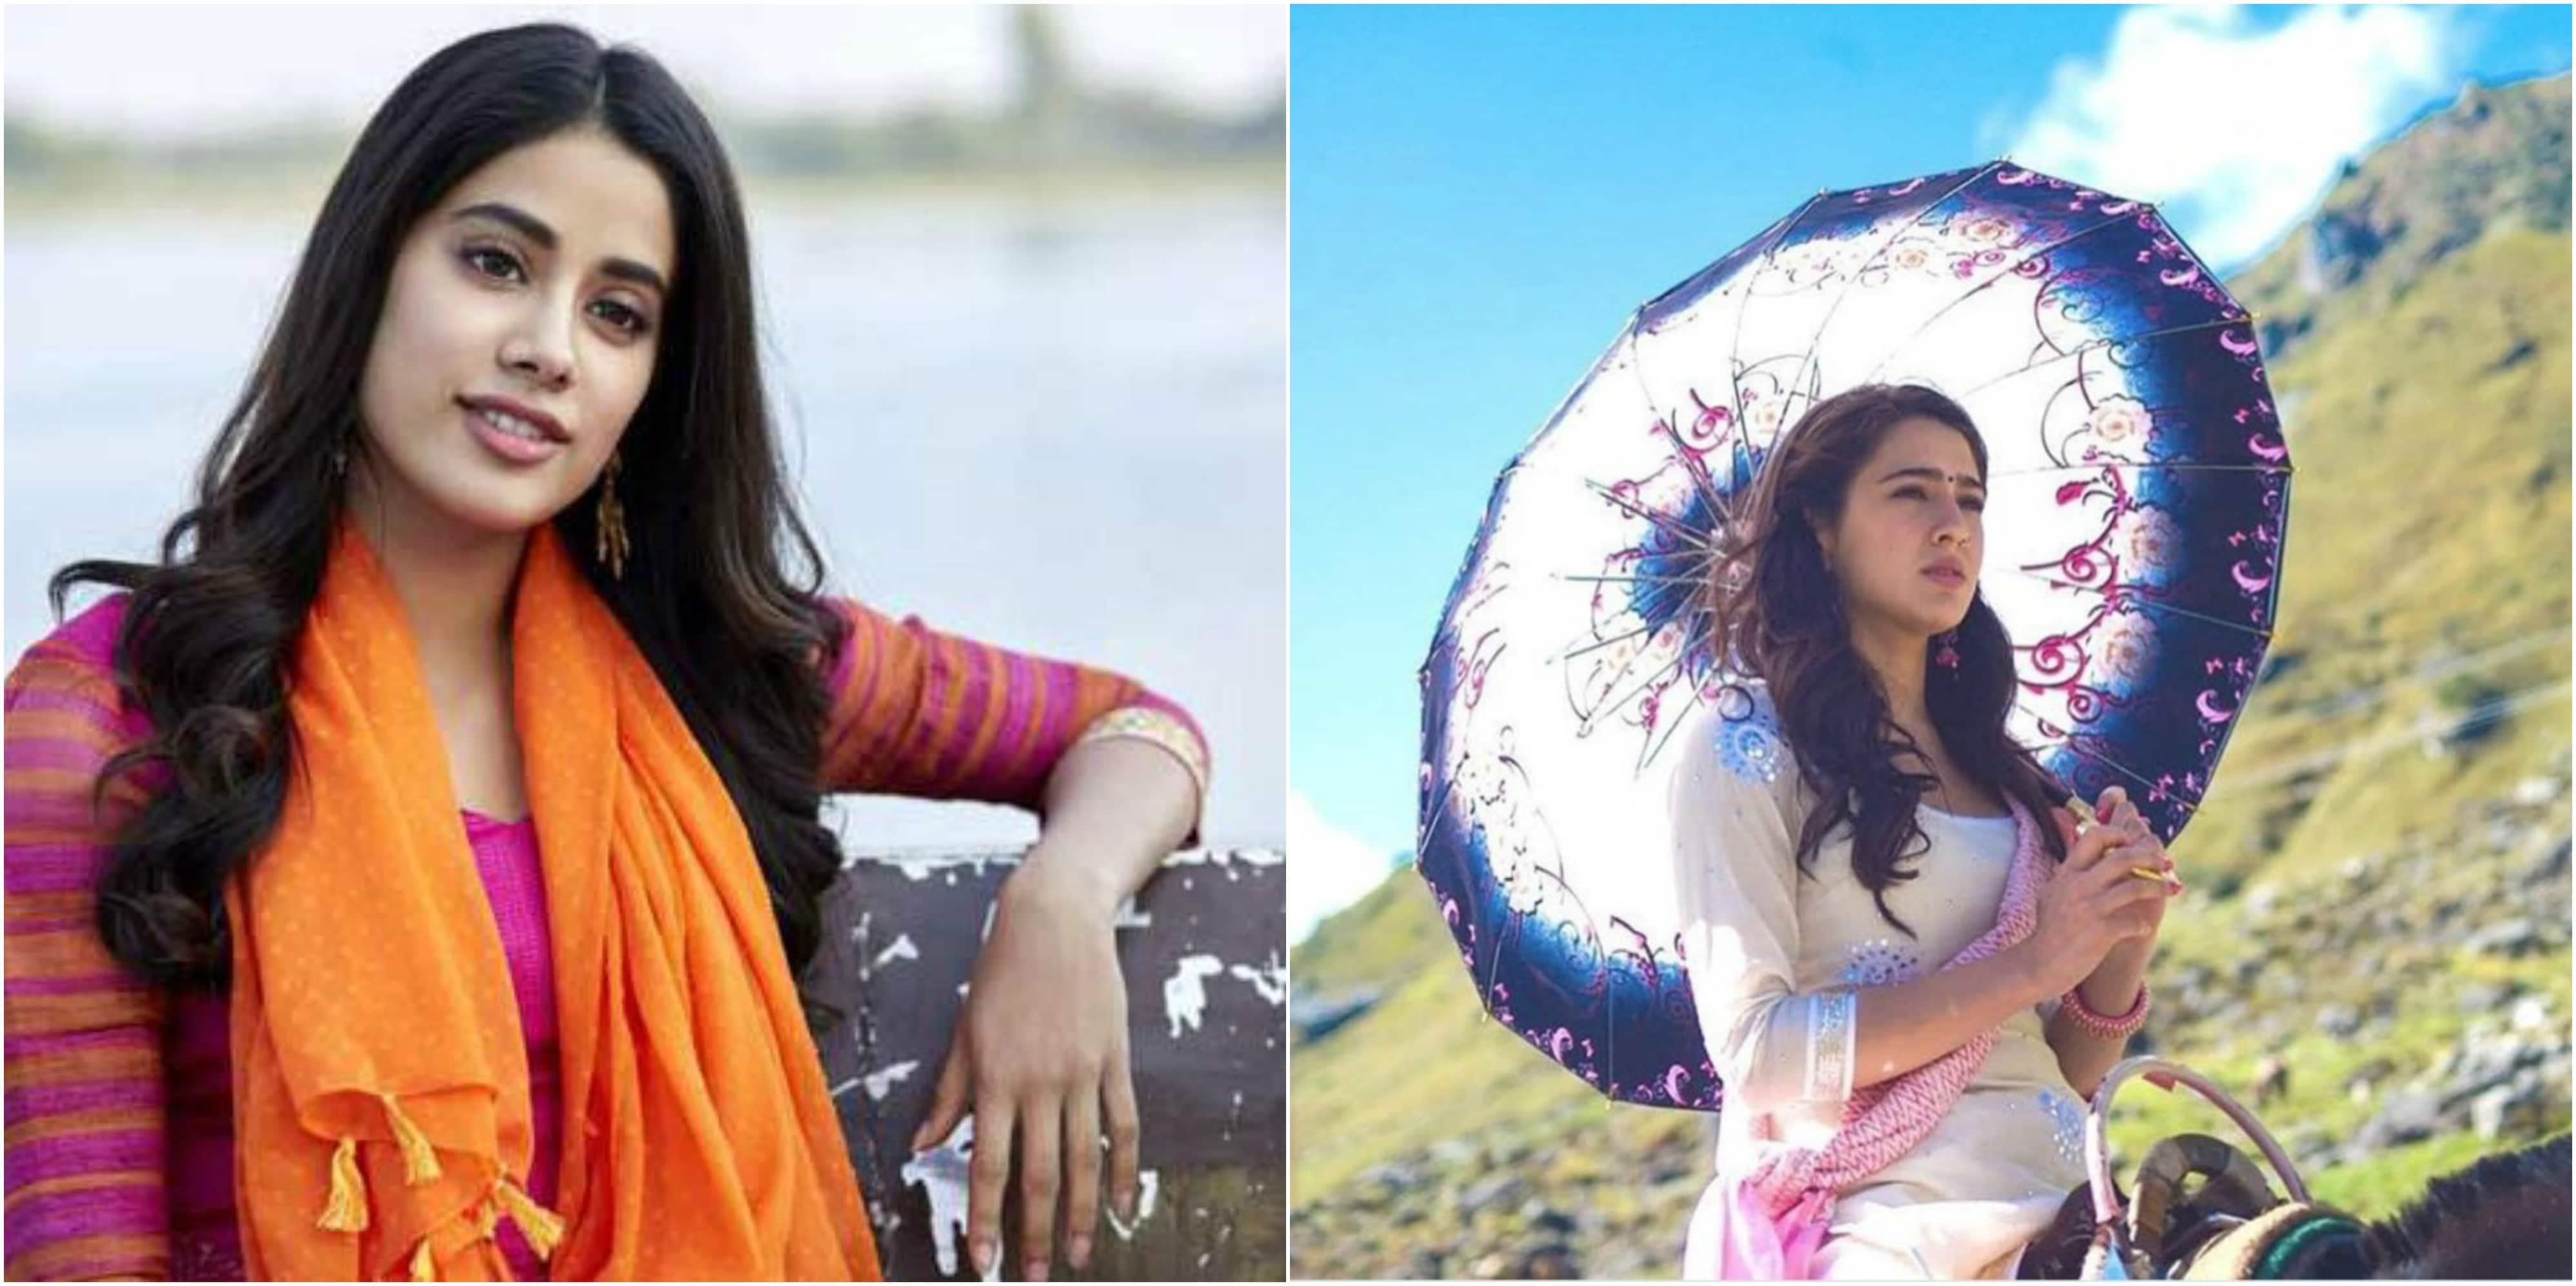 Sara Ali Khan v/s Janhvi Kapoor: Who Is Most Sensational Debutante Of 2018